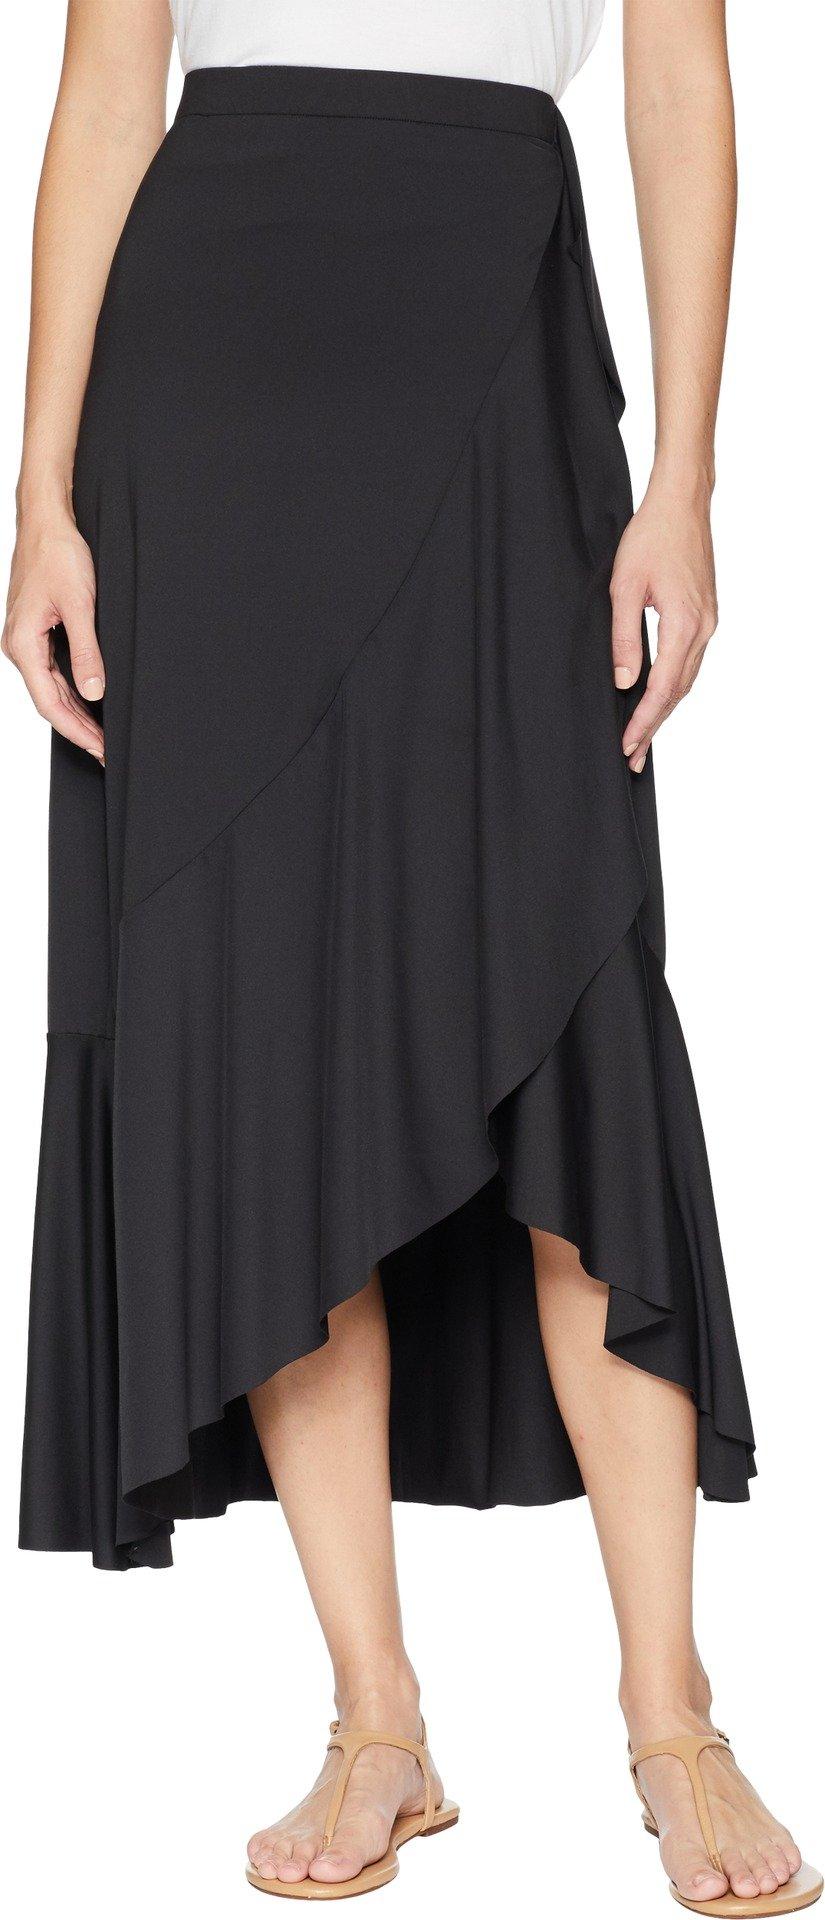 Roper Women's Faux Wrap Skirt Black Large